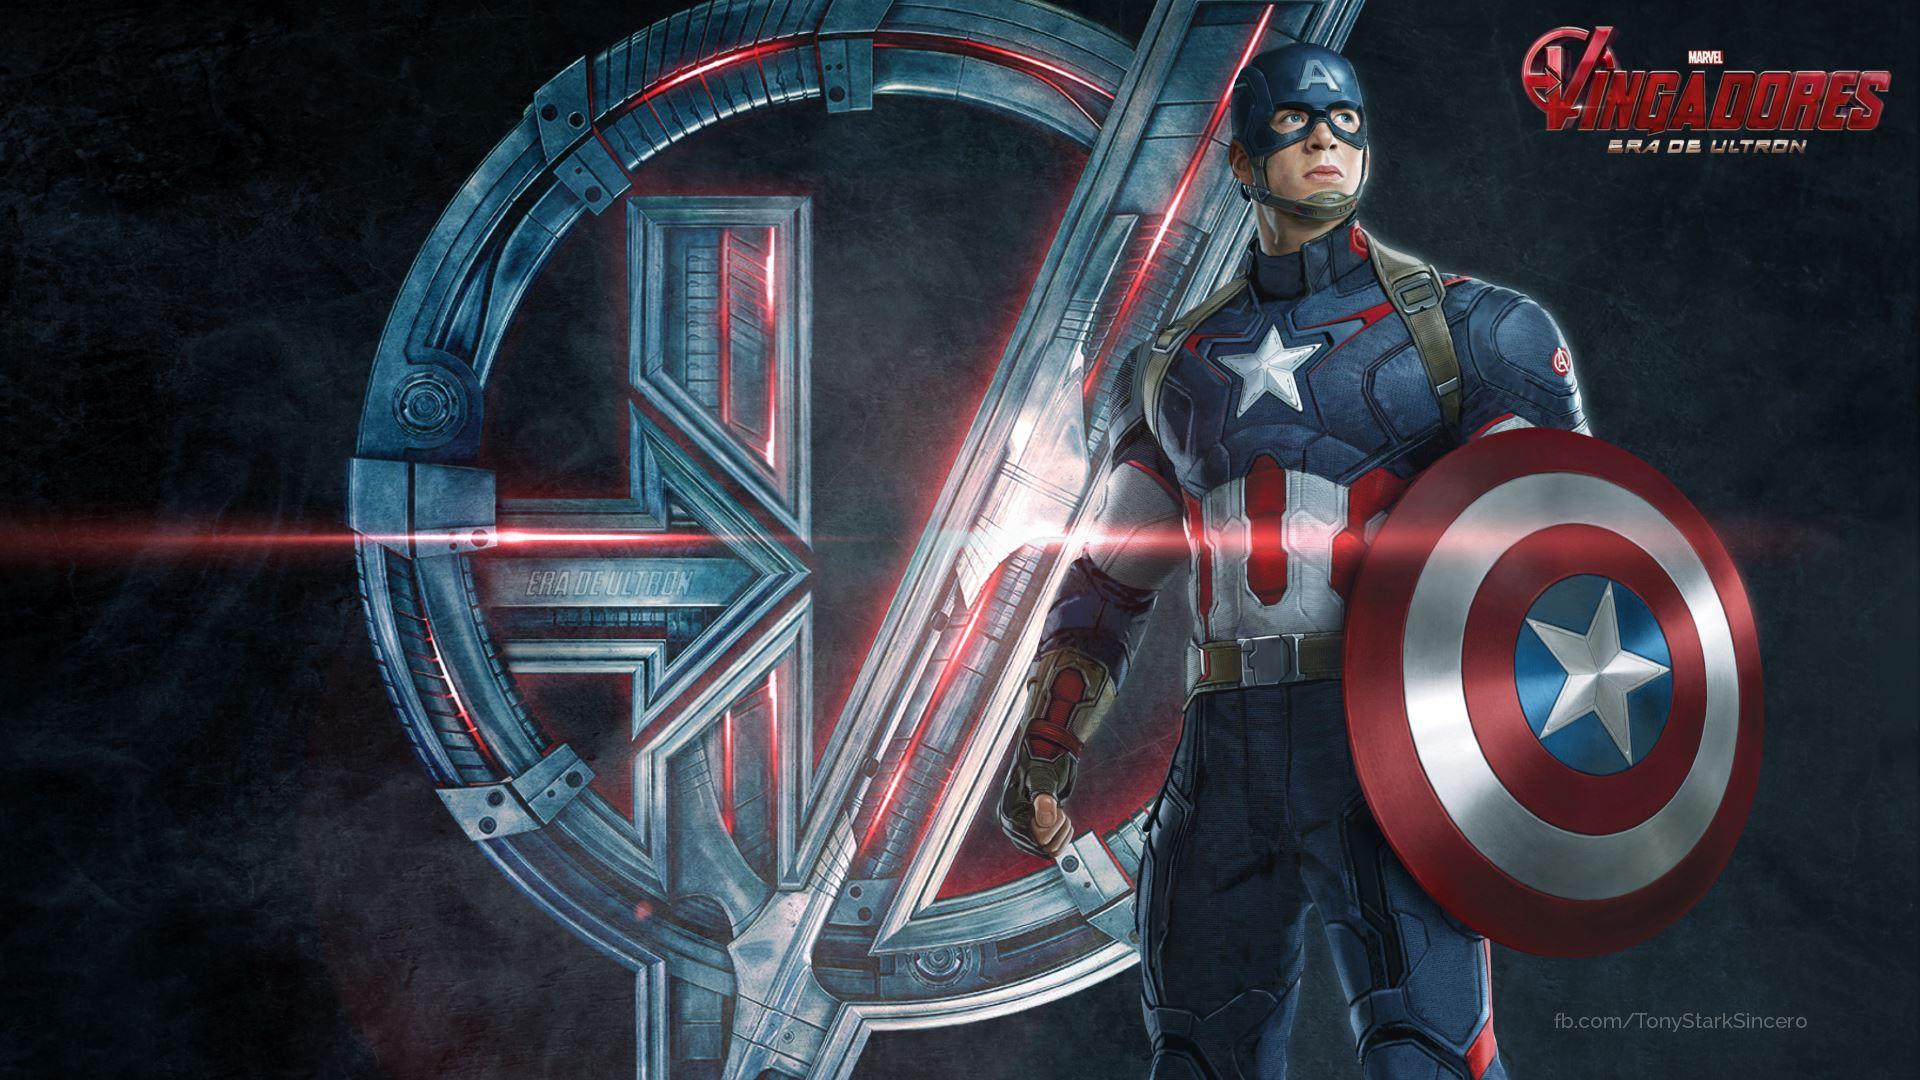 Amazing Wallpaper Marvel Avengers Age Ultron - avengers_age-of-ultron_character-wallpapers  You Should Have_85665.jpg